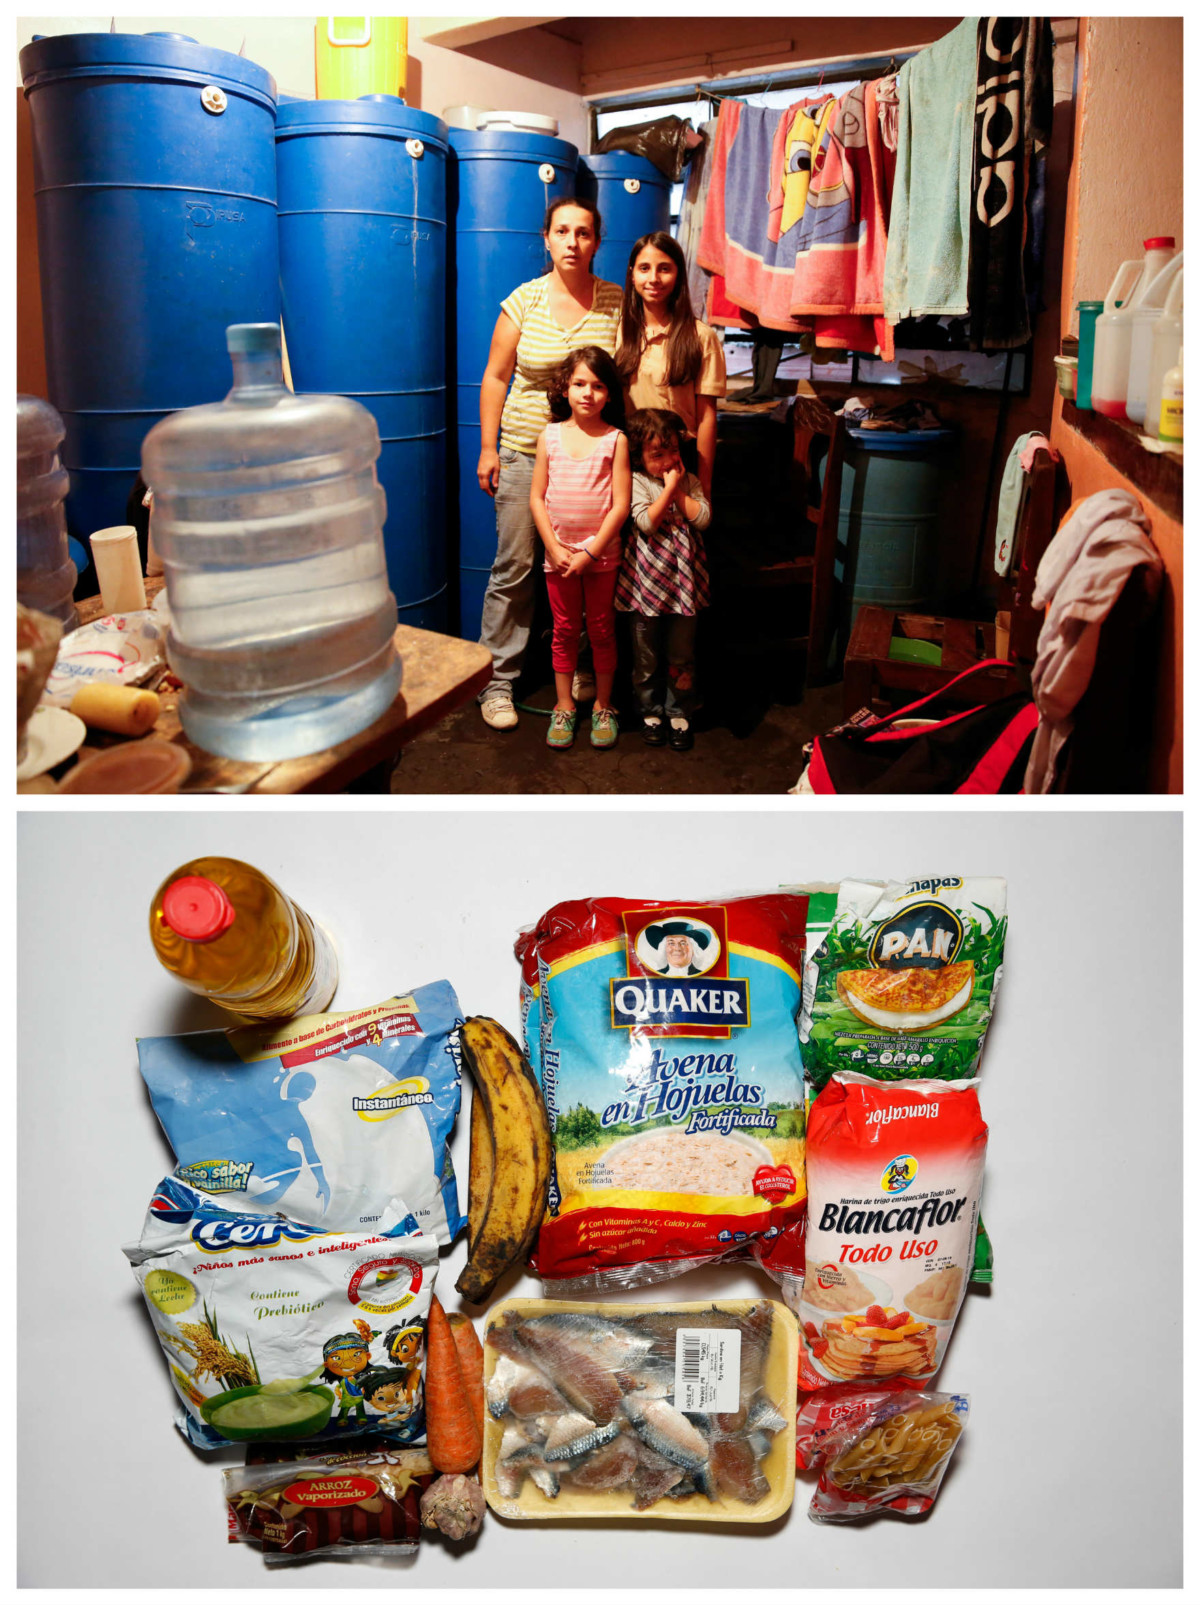 Yaneidy Guzman 一家:「糧食變成奢侈品。以前我們有閒錢買衫,現在全部用在口糧。」